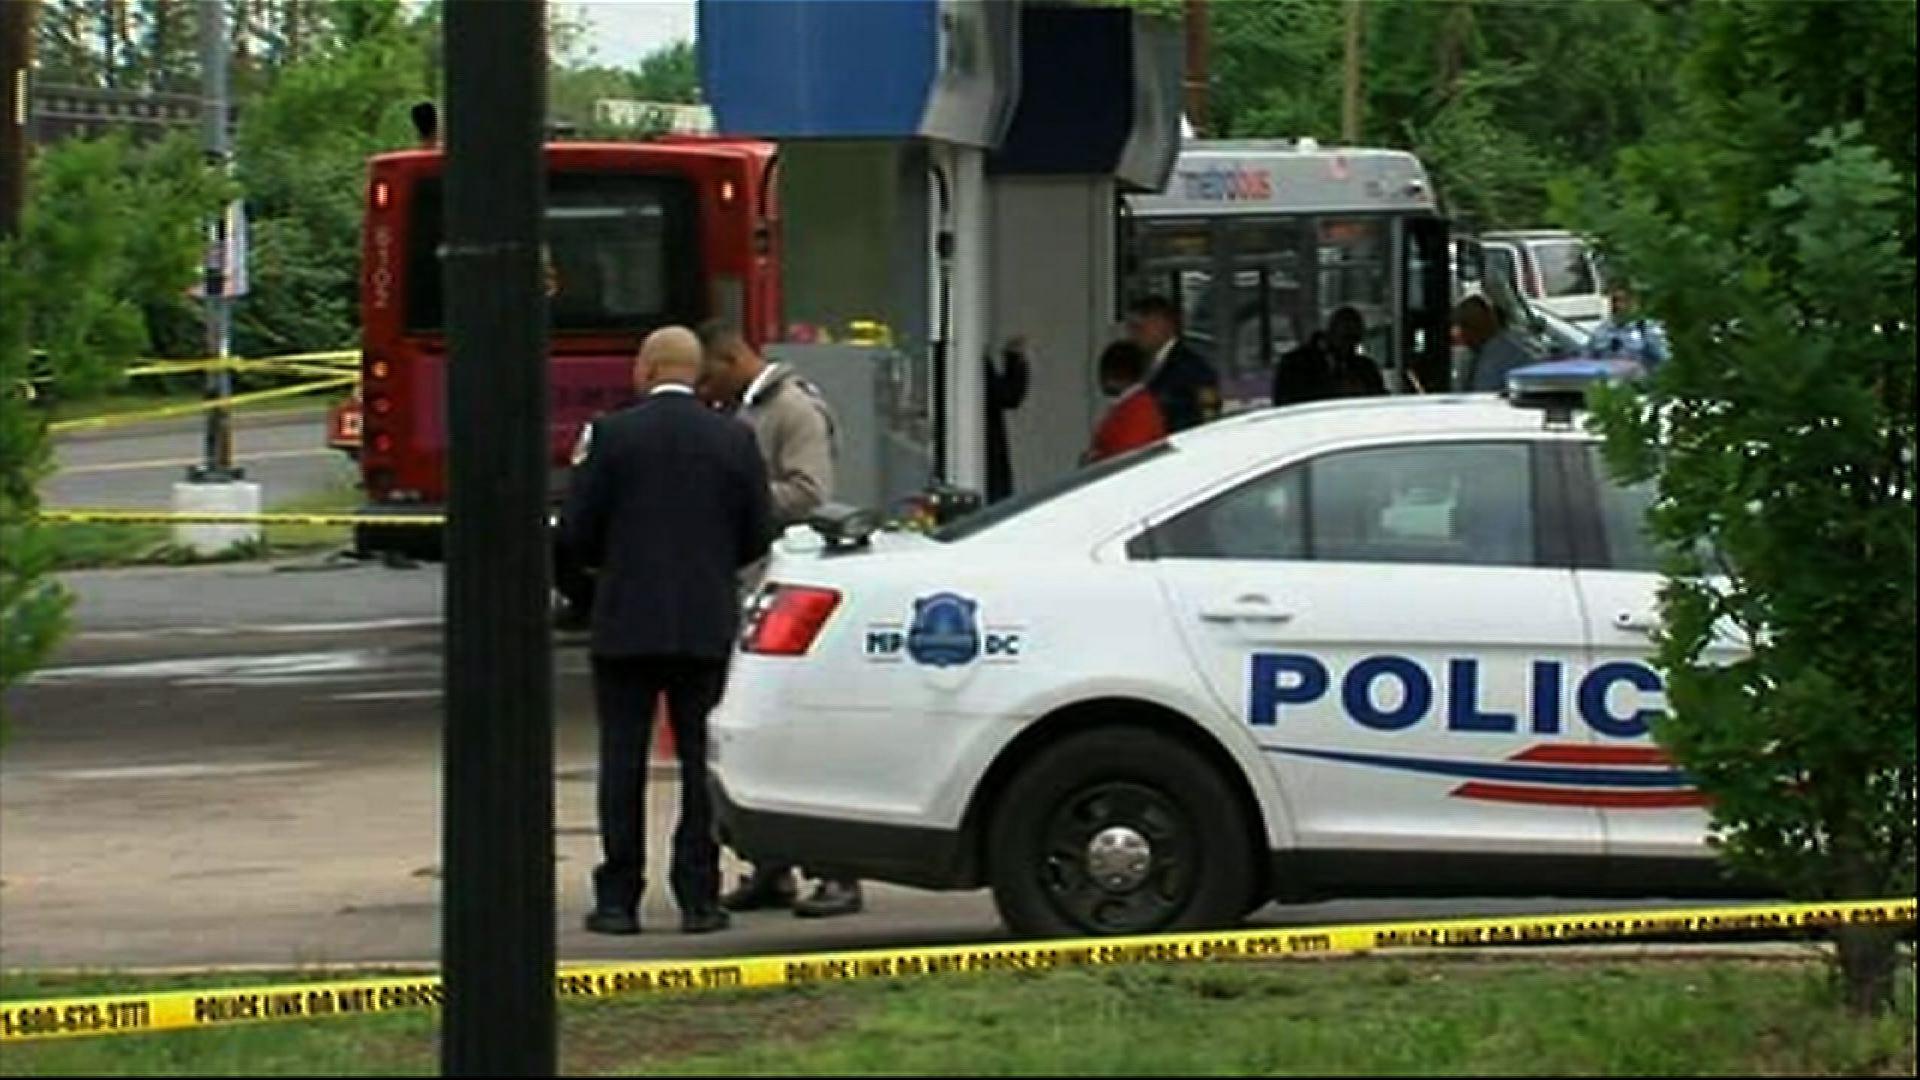 Man Attacks Driver in Bus Heist, Pedestrian Dead